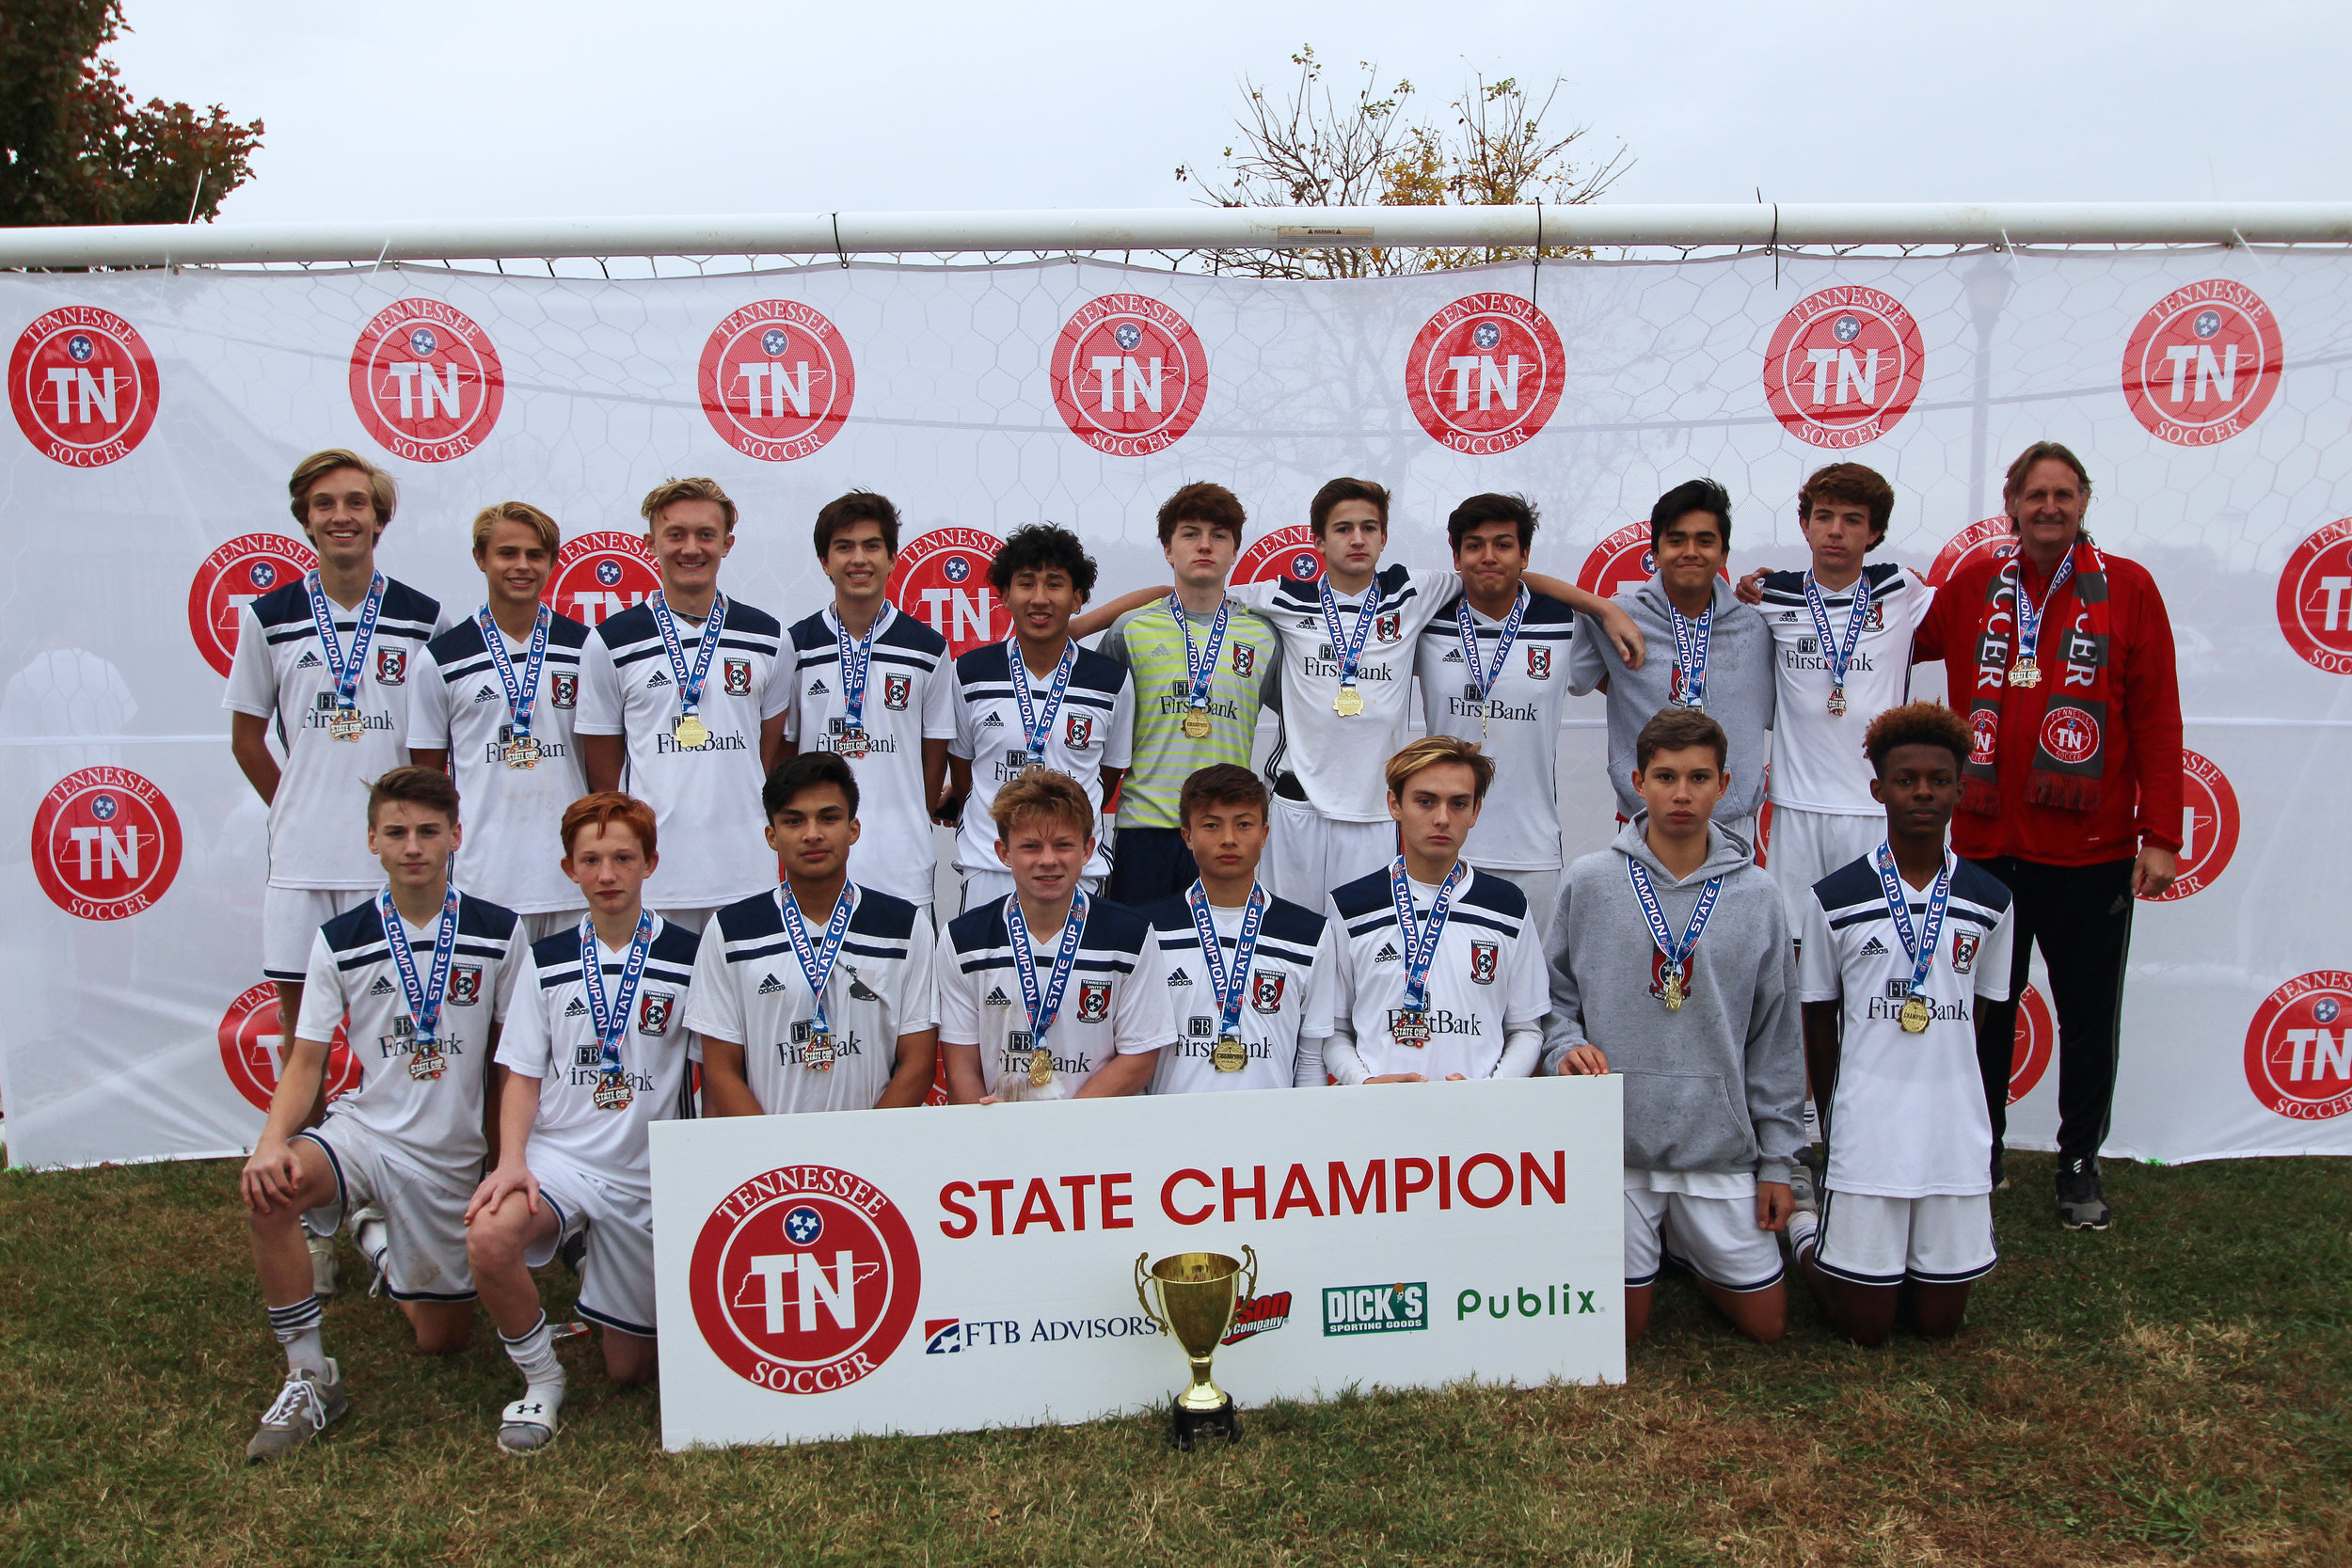 D1 U16 Boys Champion - TUSC 2003 Boys Red